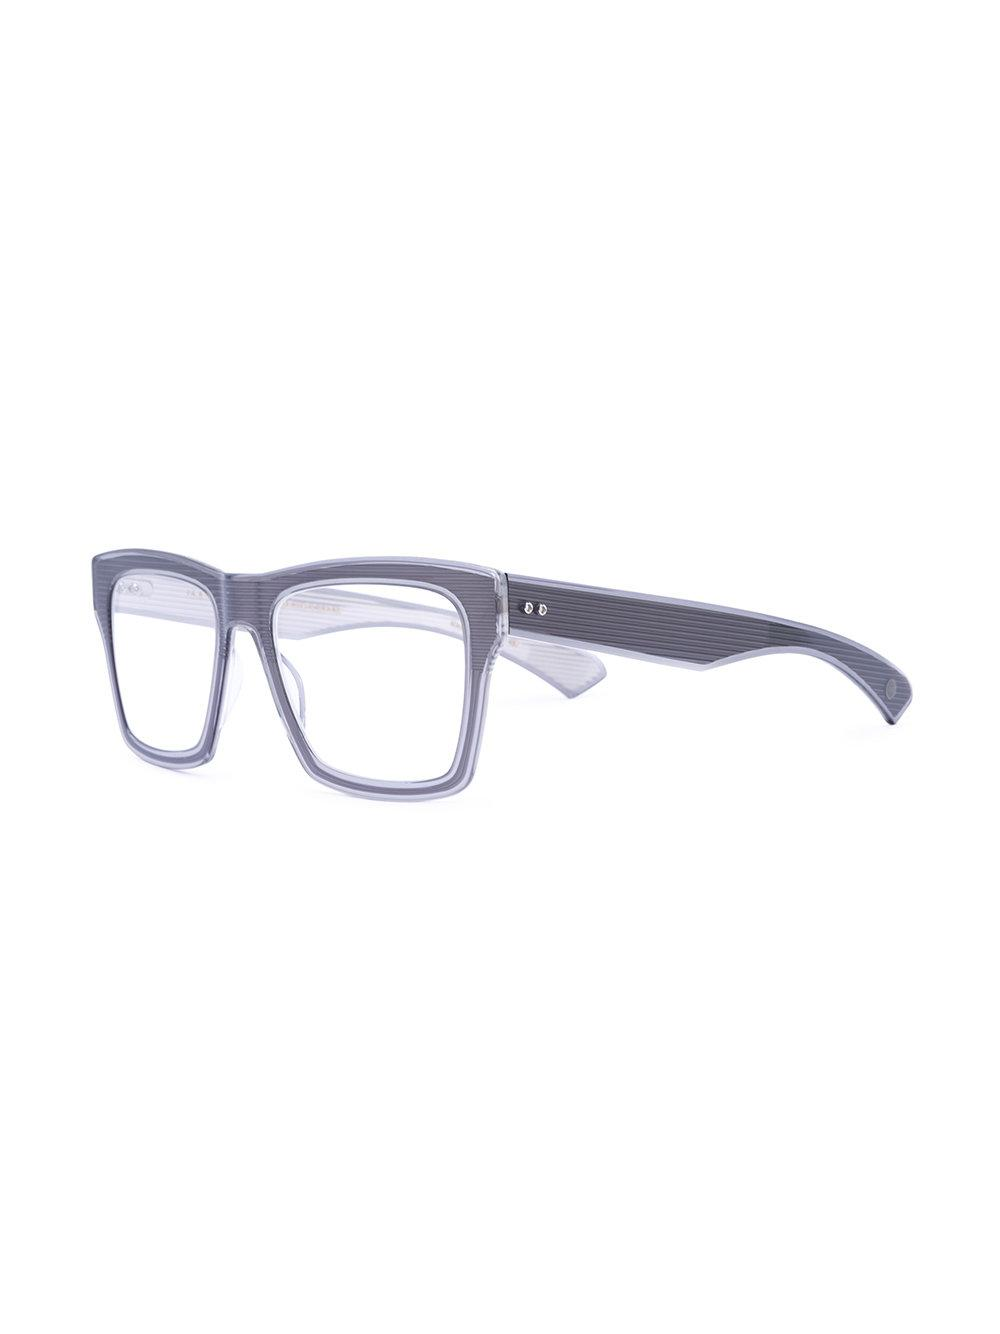 Dita Eyewear 'insider Two' Sunglasses in Grey (Grey) for Men